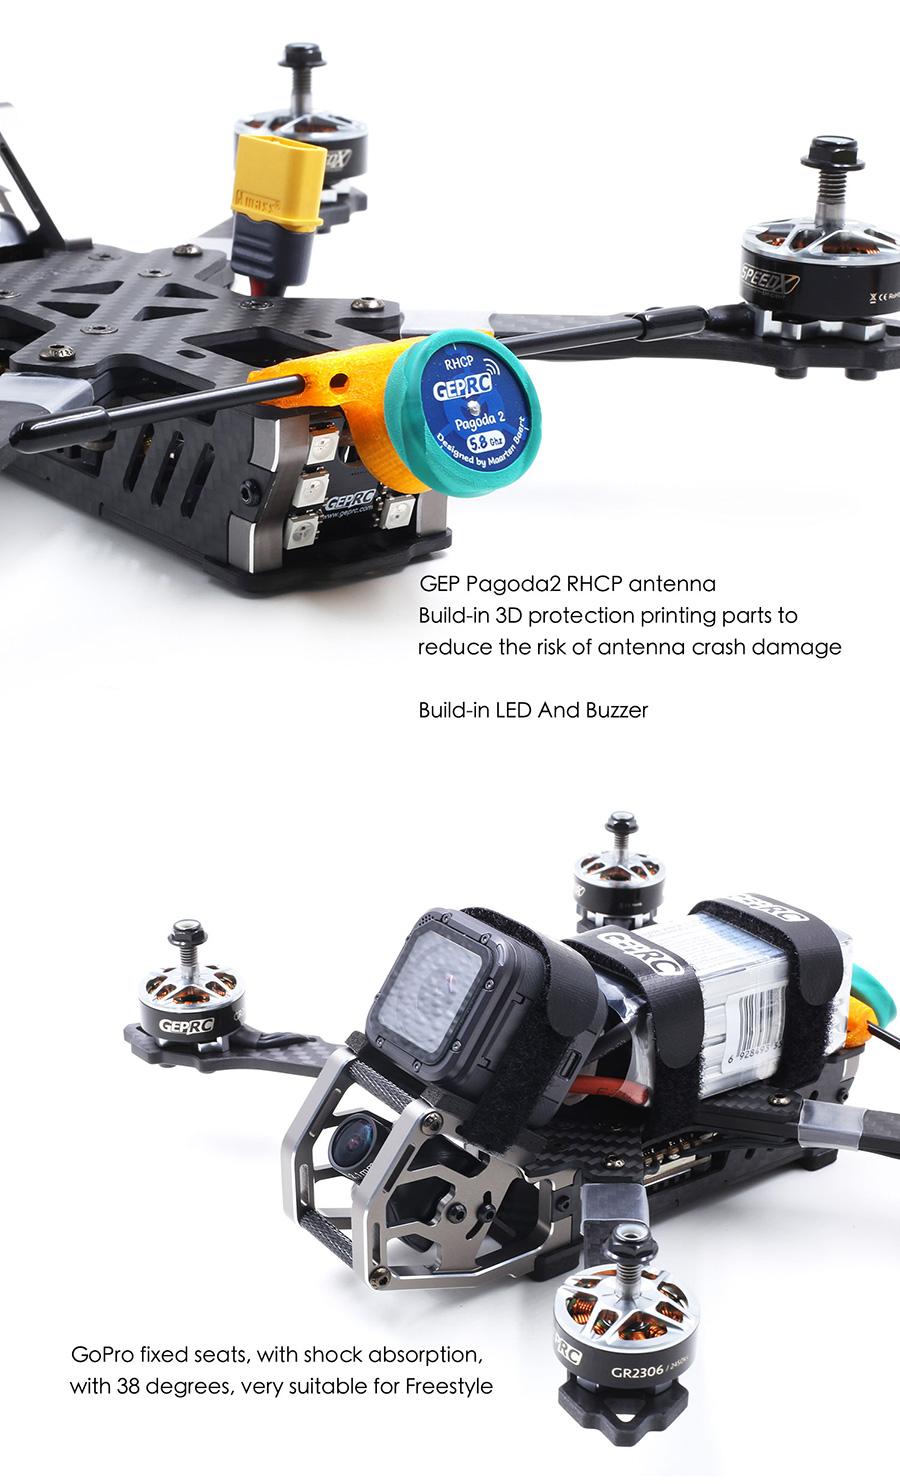 geprc-elegant-fpv-drone_10.jpg